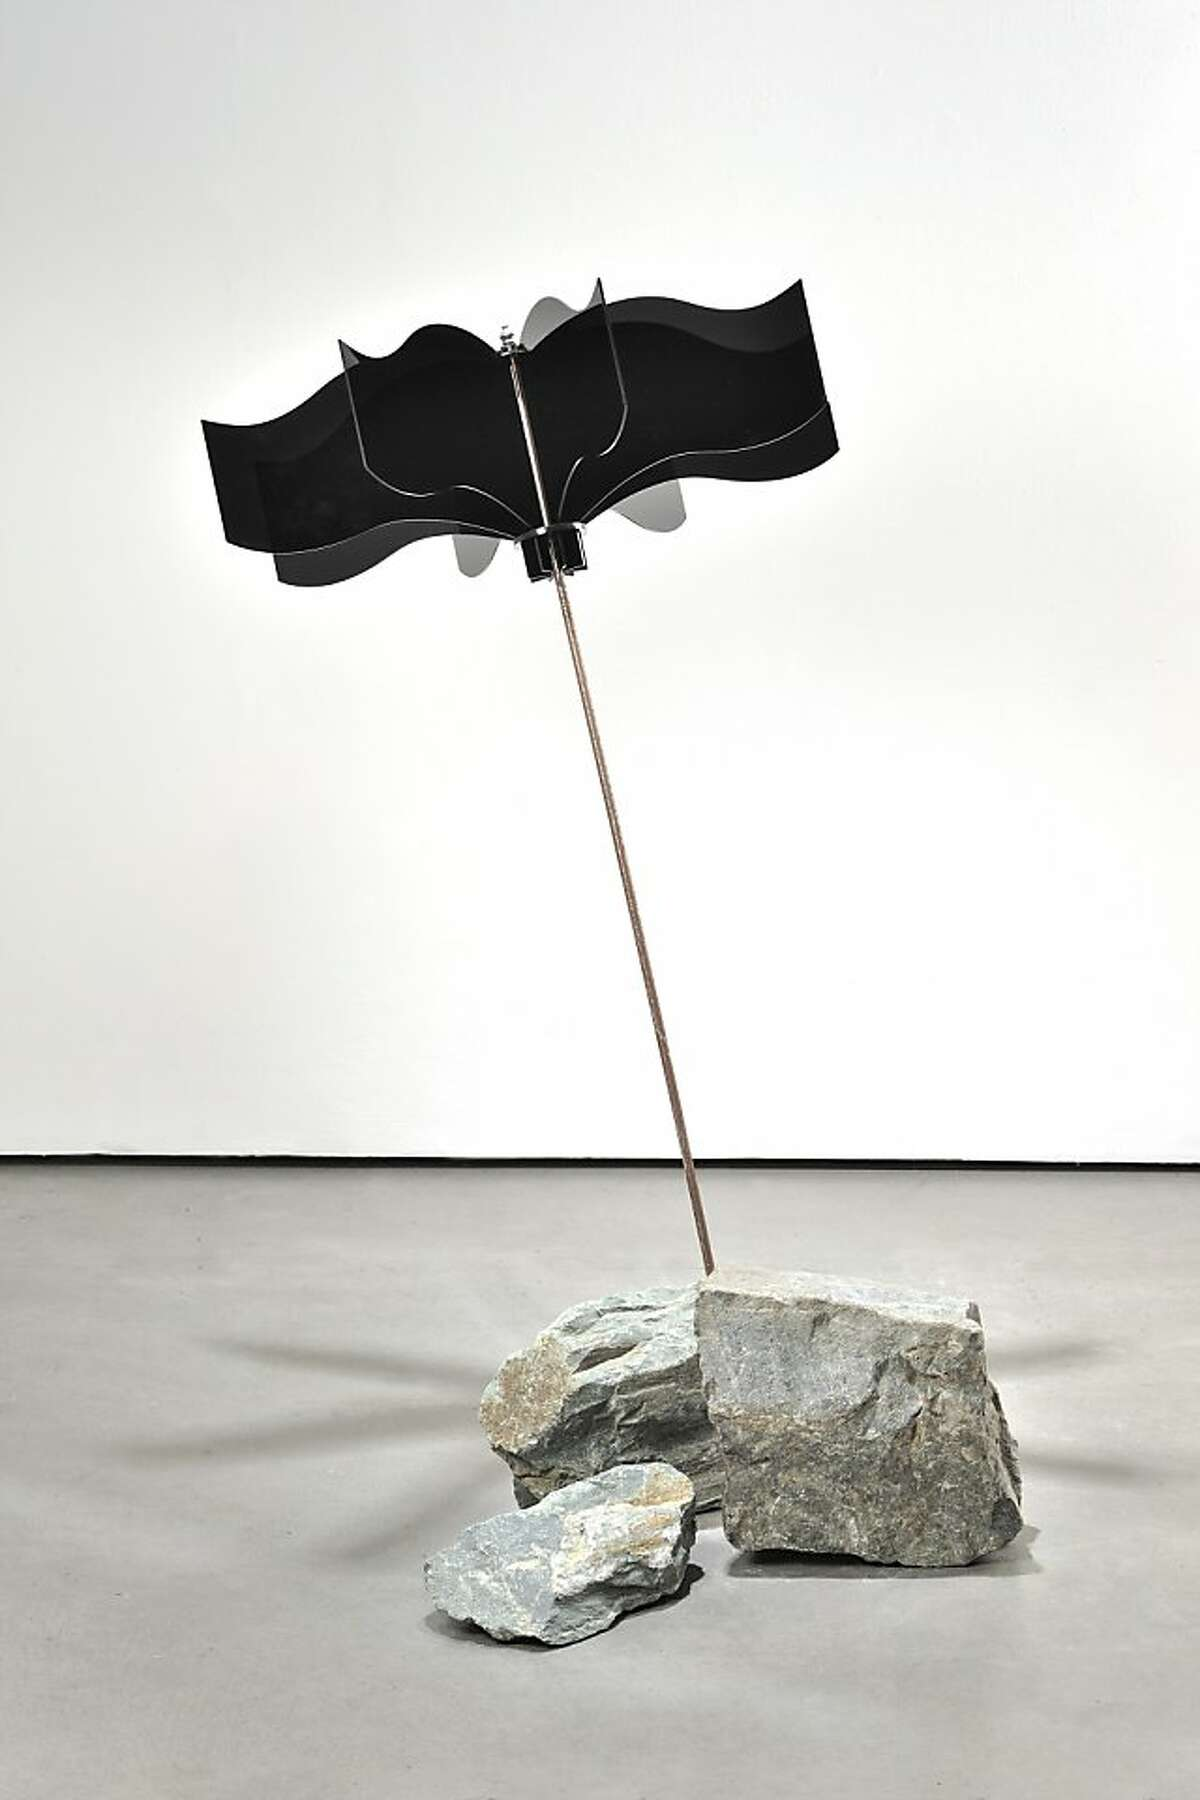 Leah Markos' Brella Black acylic, steel, stone46 h x 30 diameter width 2013